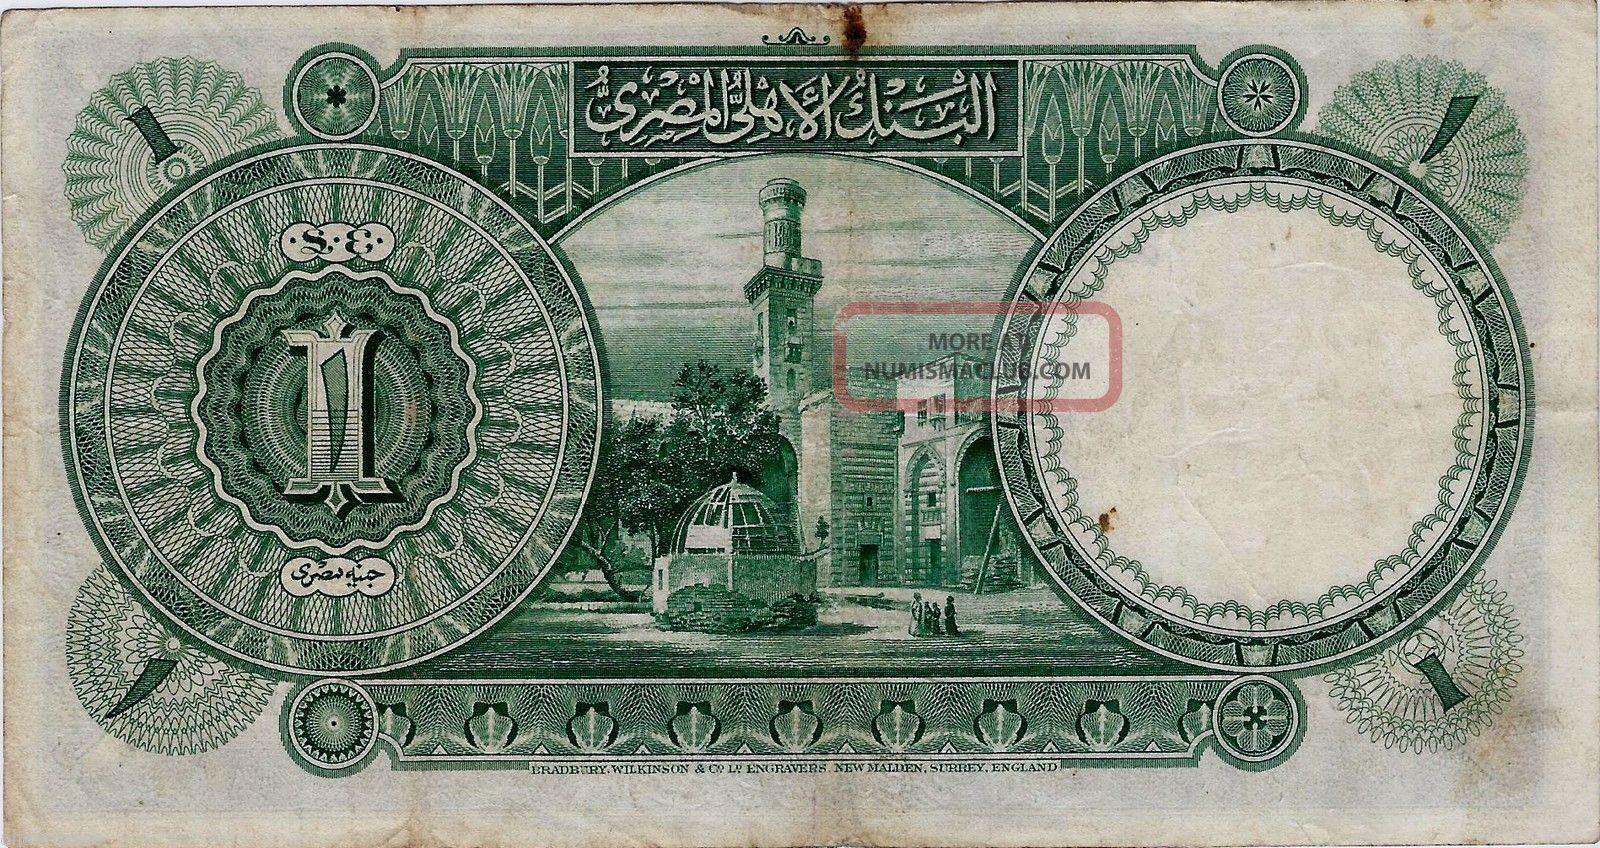 Egyptian 1 Pound 1945 National Bank Of Egypt, Nixon Sign - Vf+